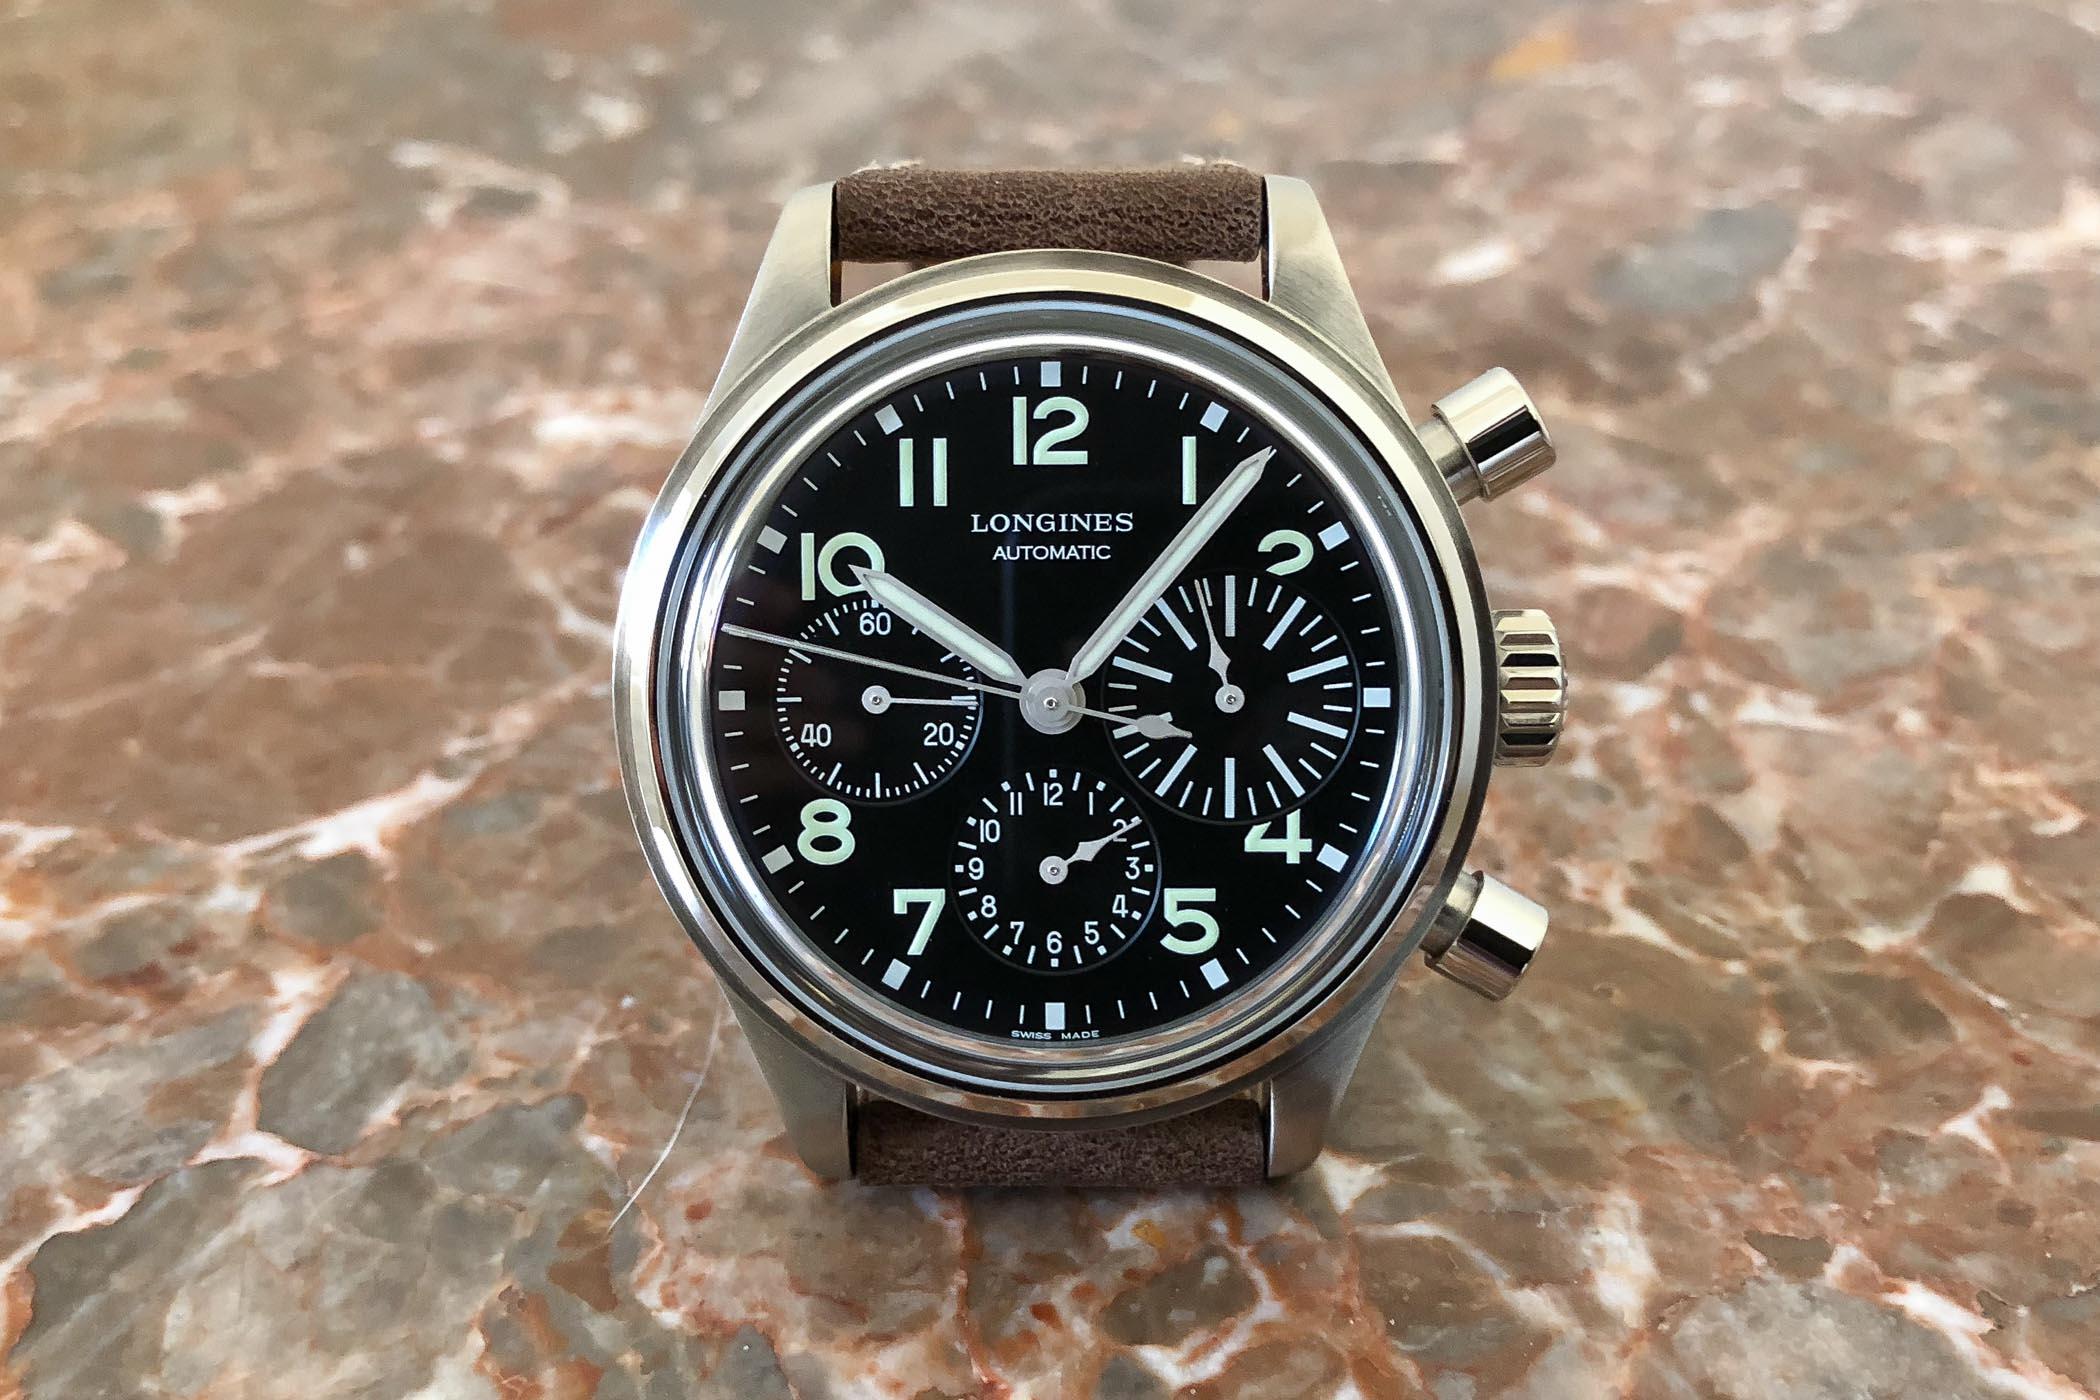 Longines Avigation BigEye Chronograph Pilot - Review